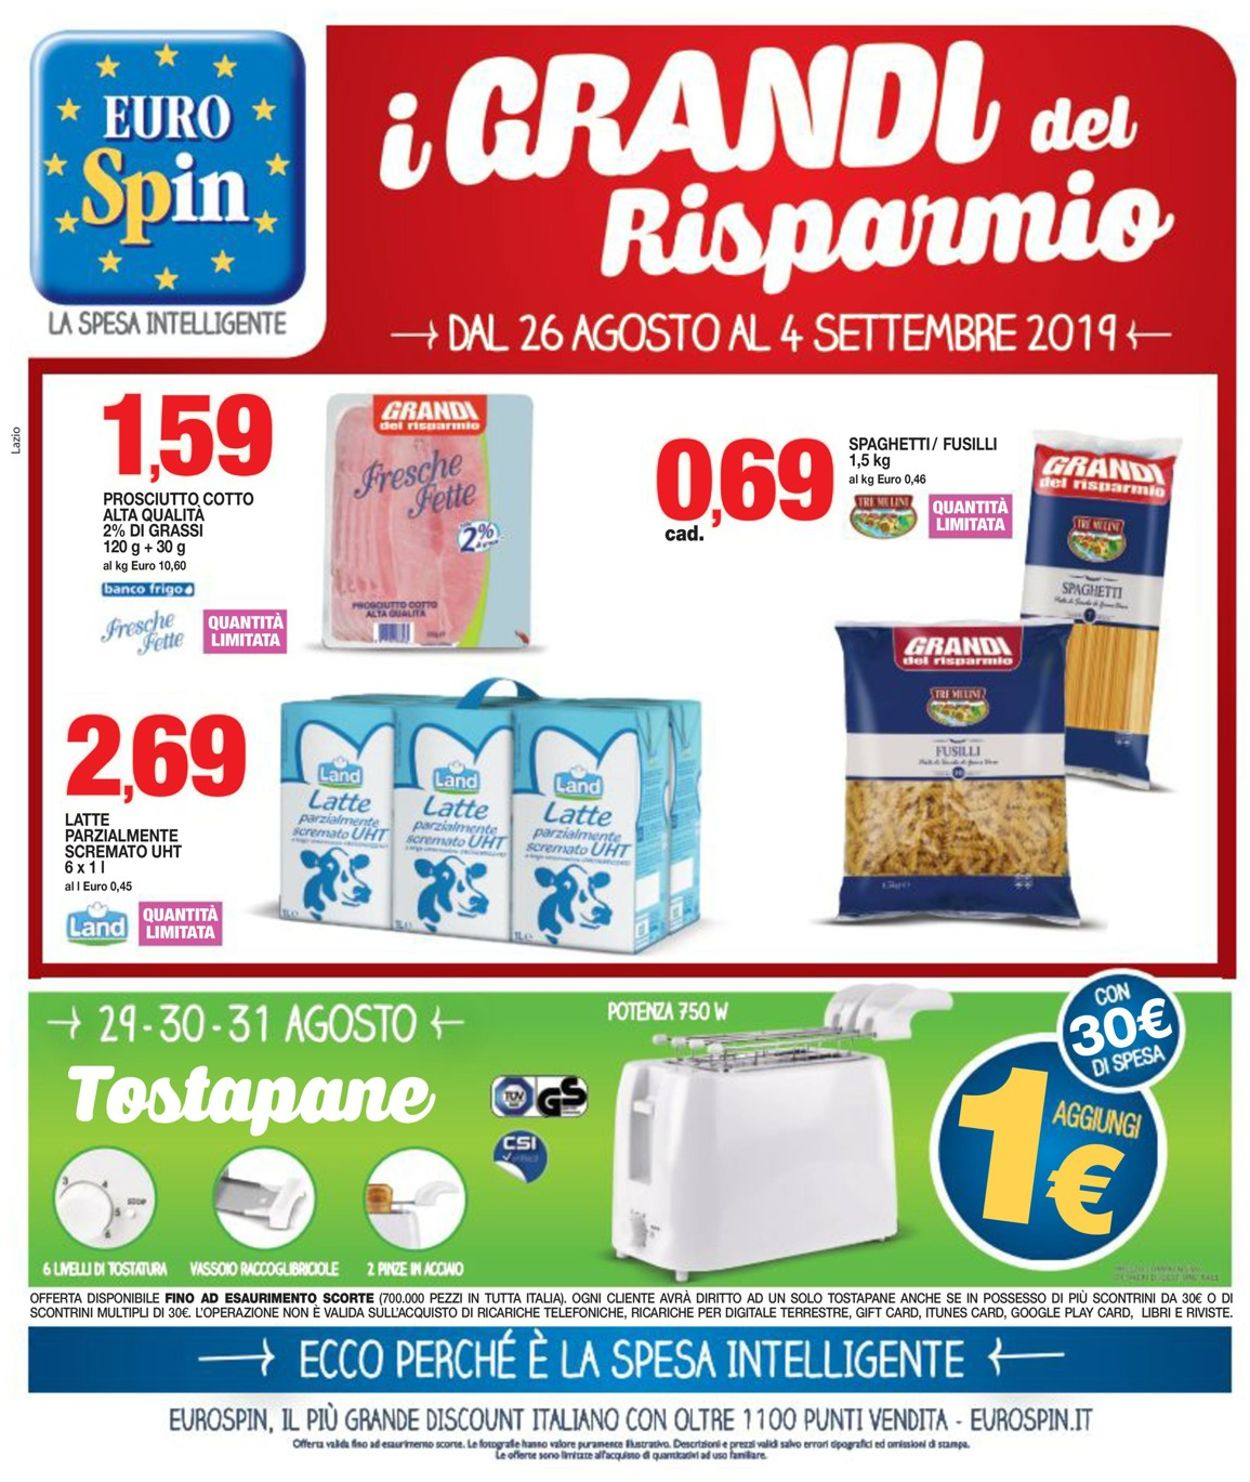 Volantino EURO Spin - Offerte 26/08-04/09/2019